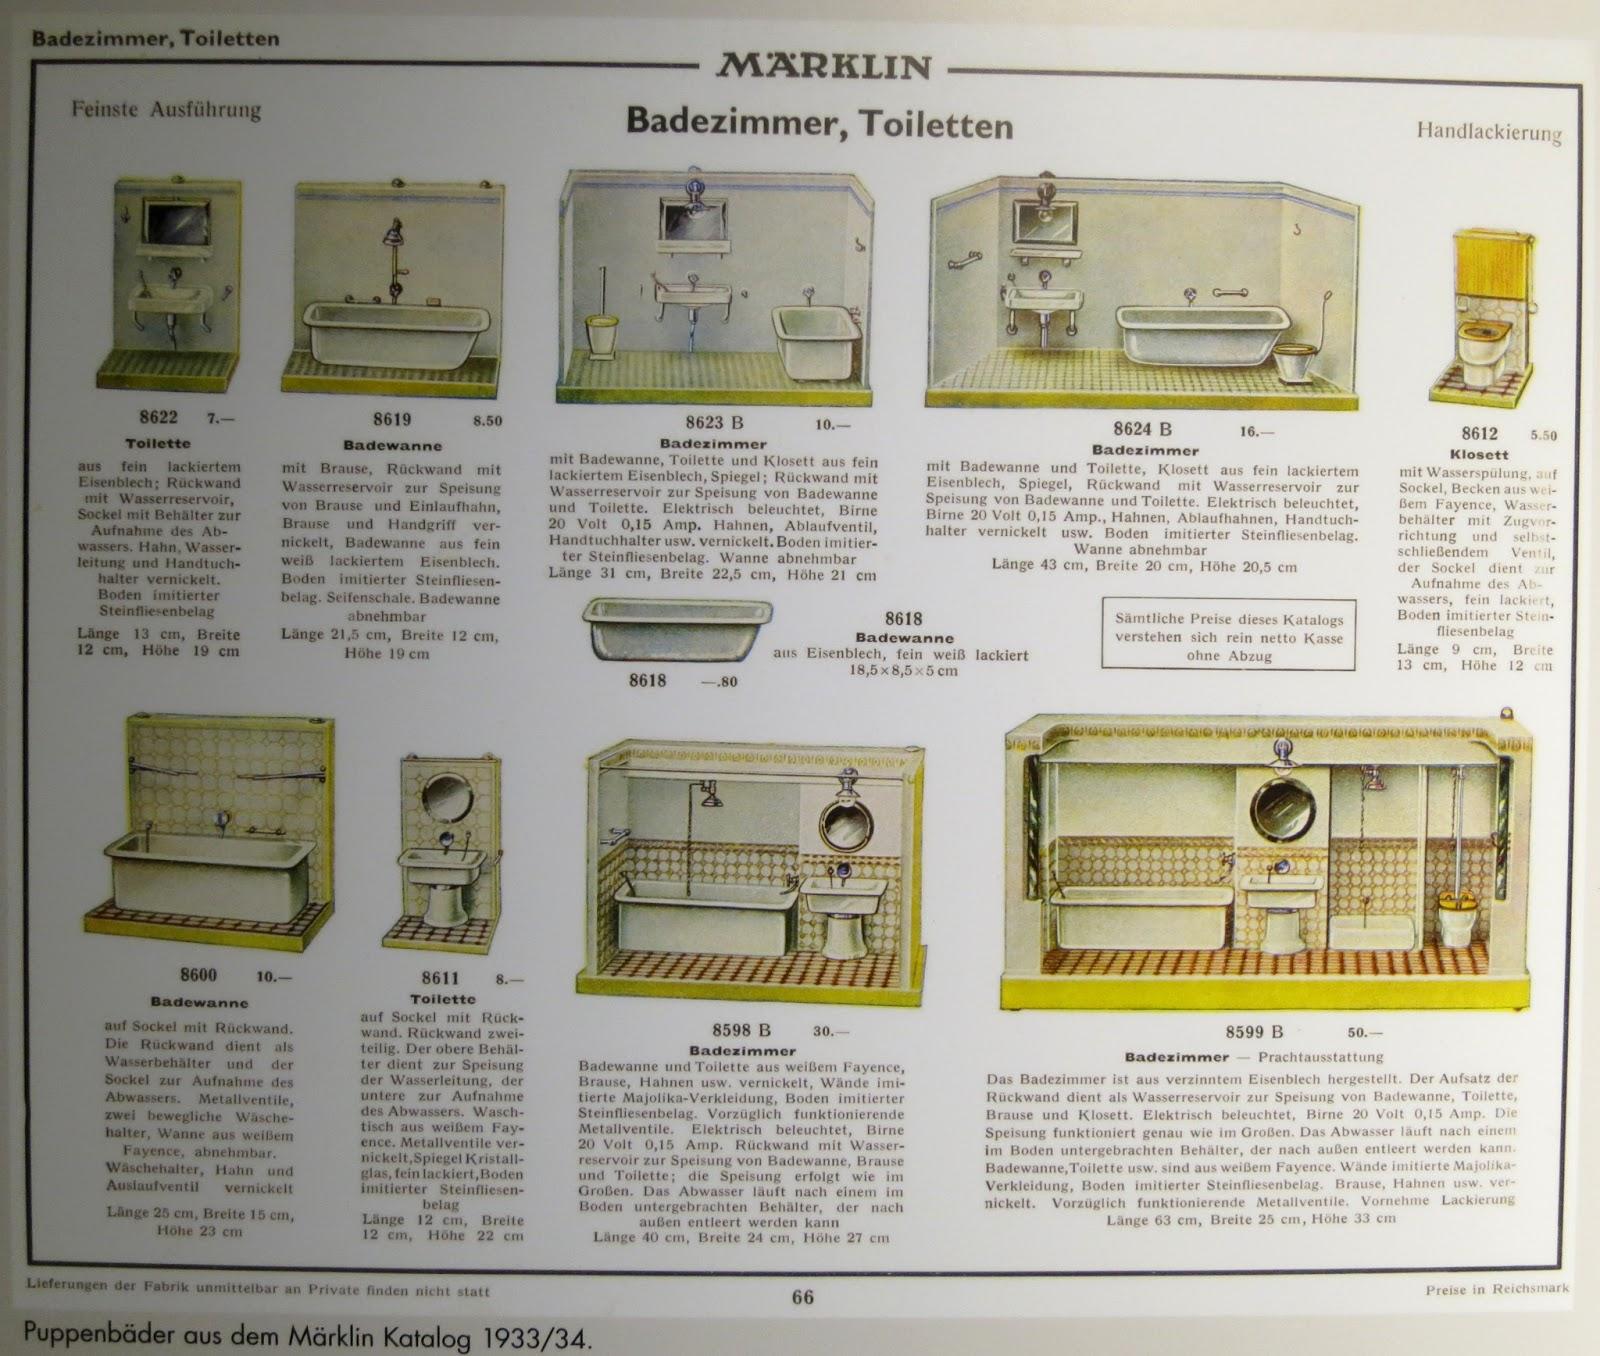 diepuppenstubensammlerin: februar 2013, Badezimmer ideen